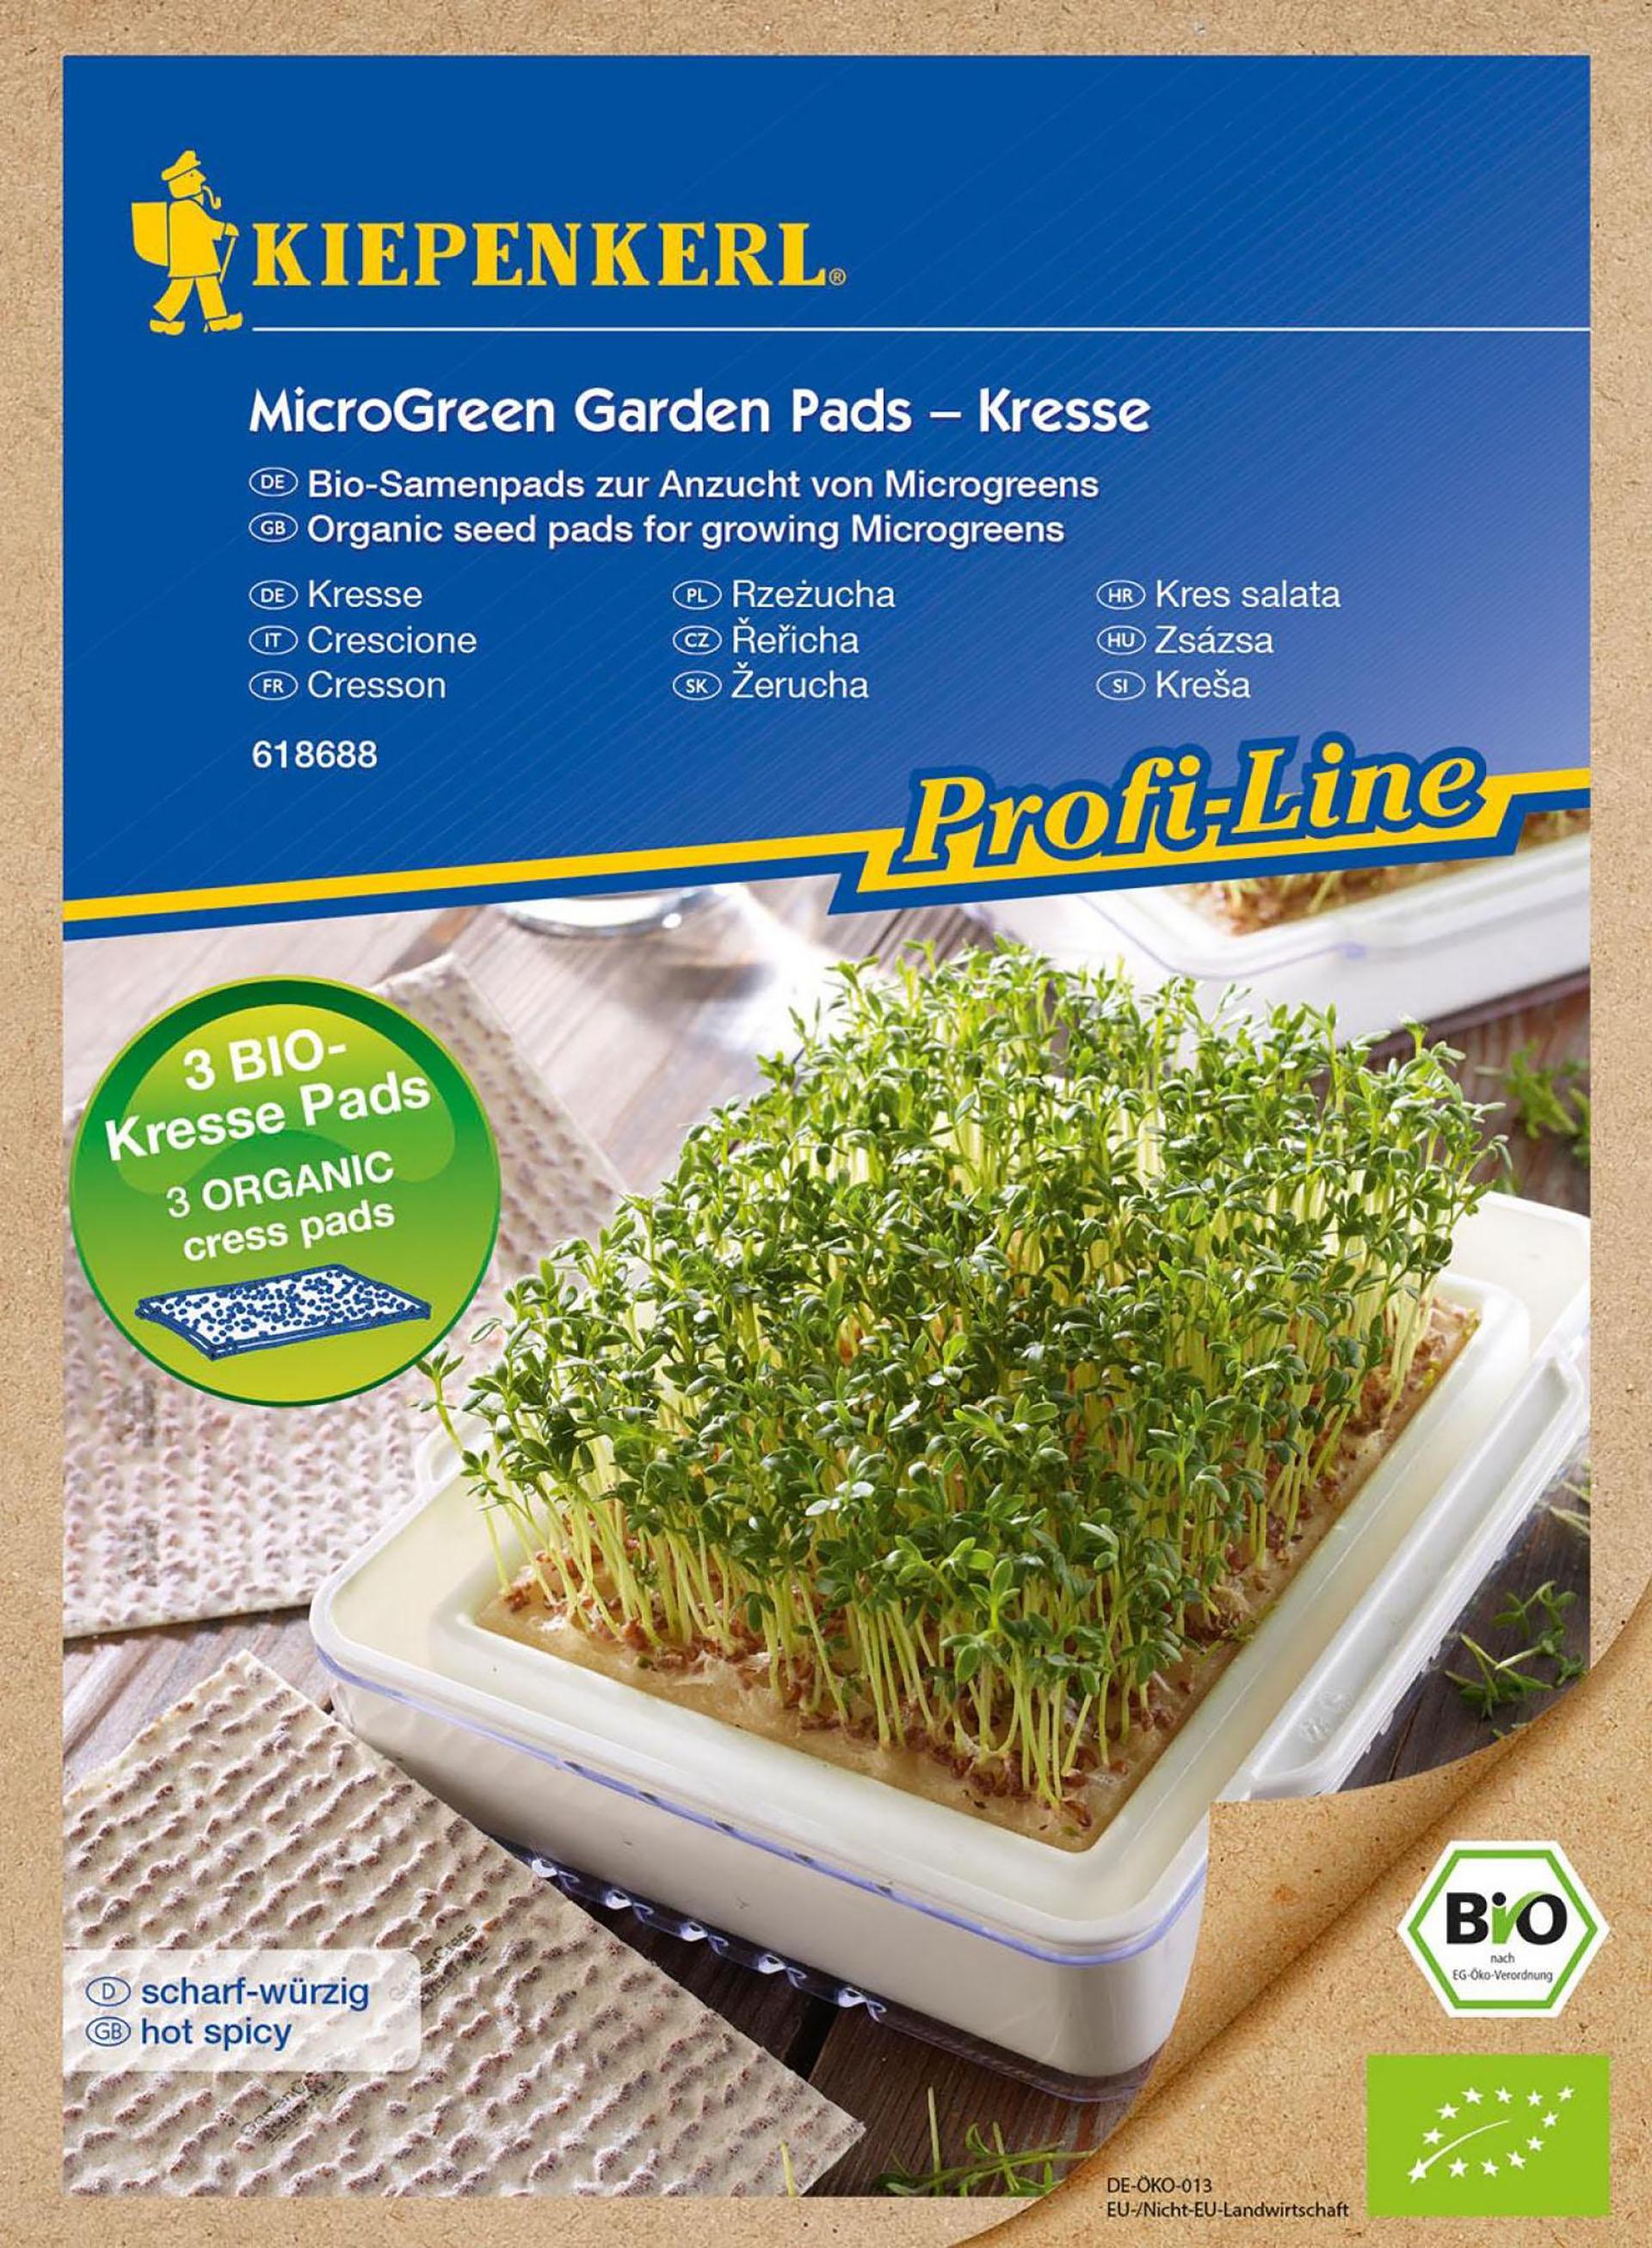 MicroGreen Garden BIO-Kresse Nachfüllpads